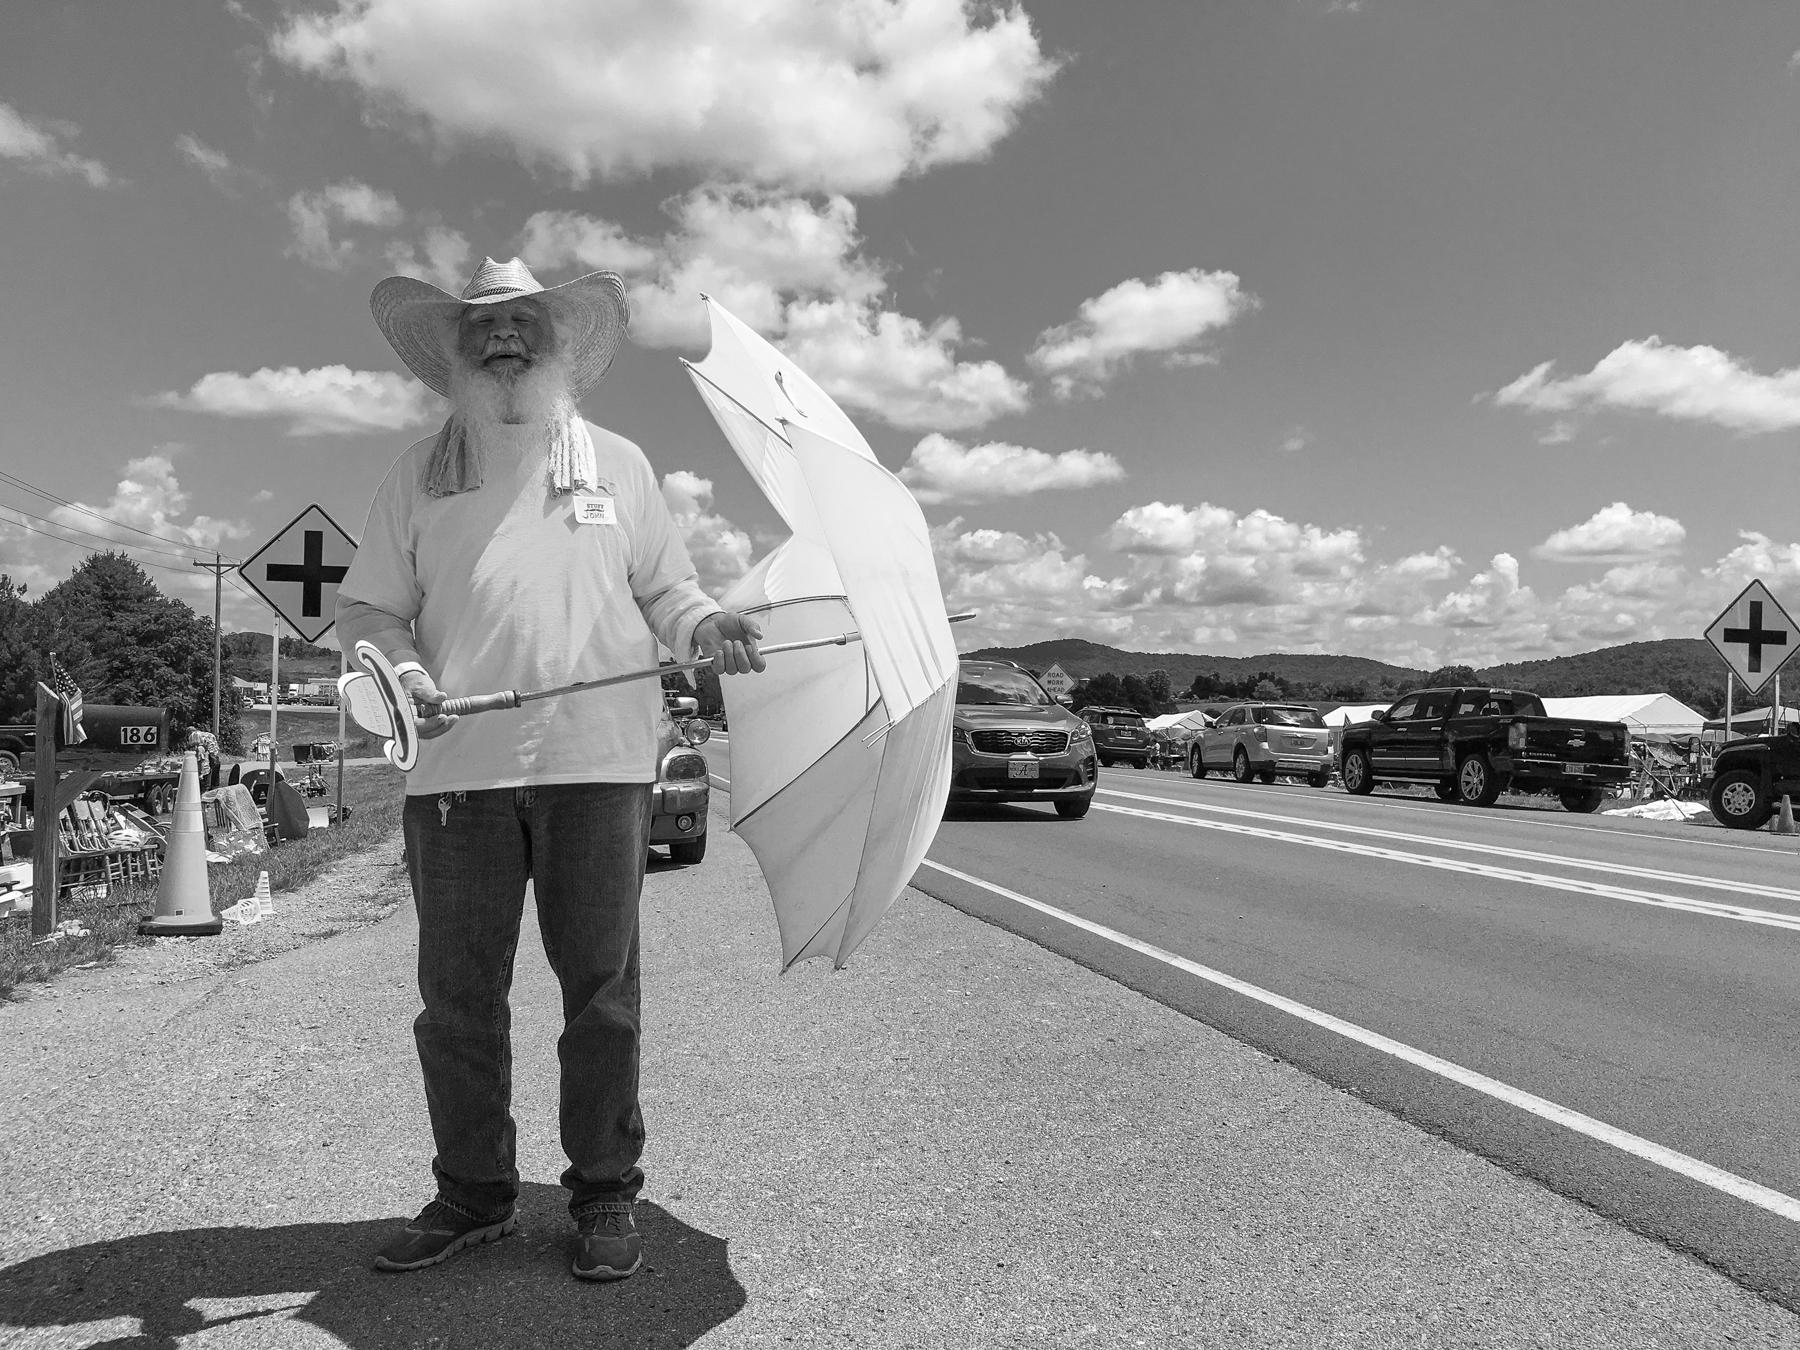 Directing traffic in Kentucky